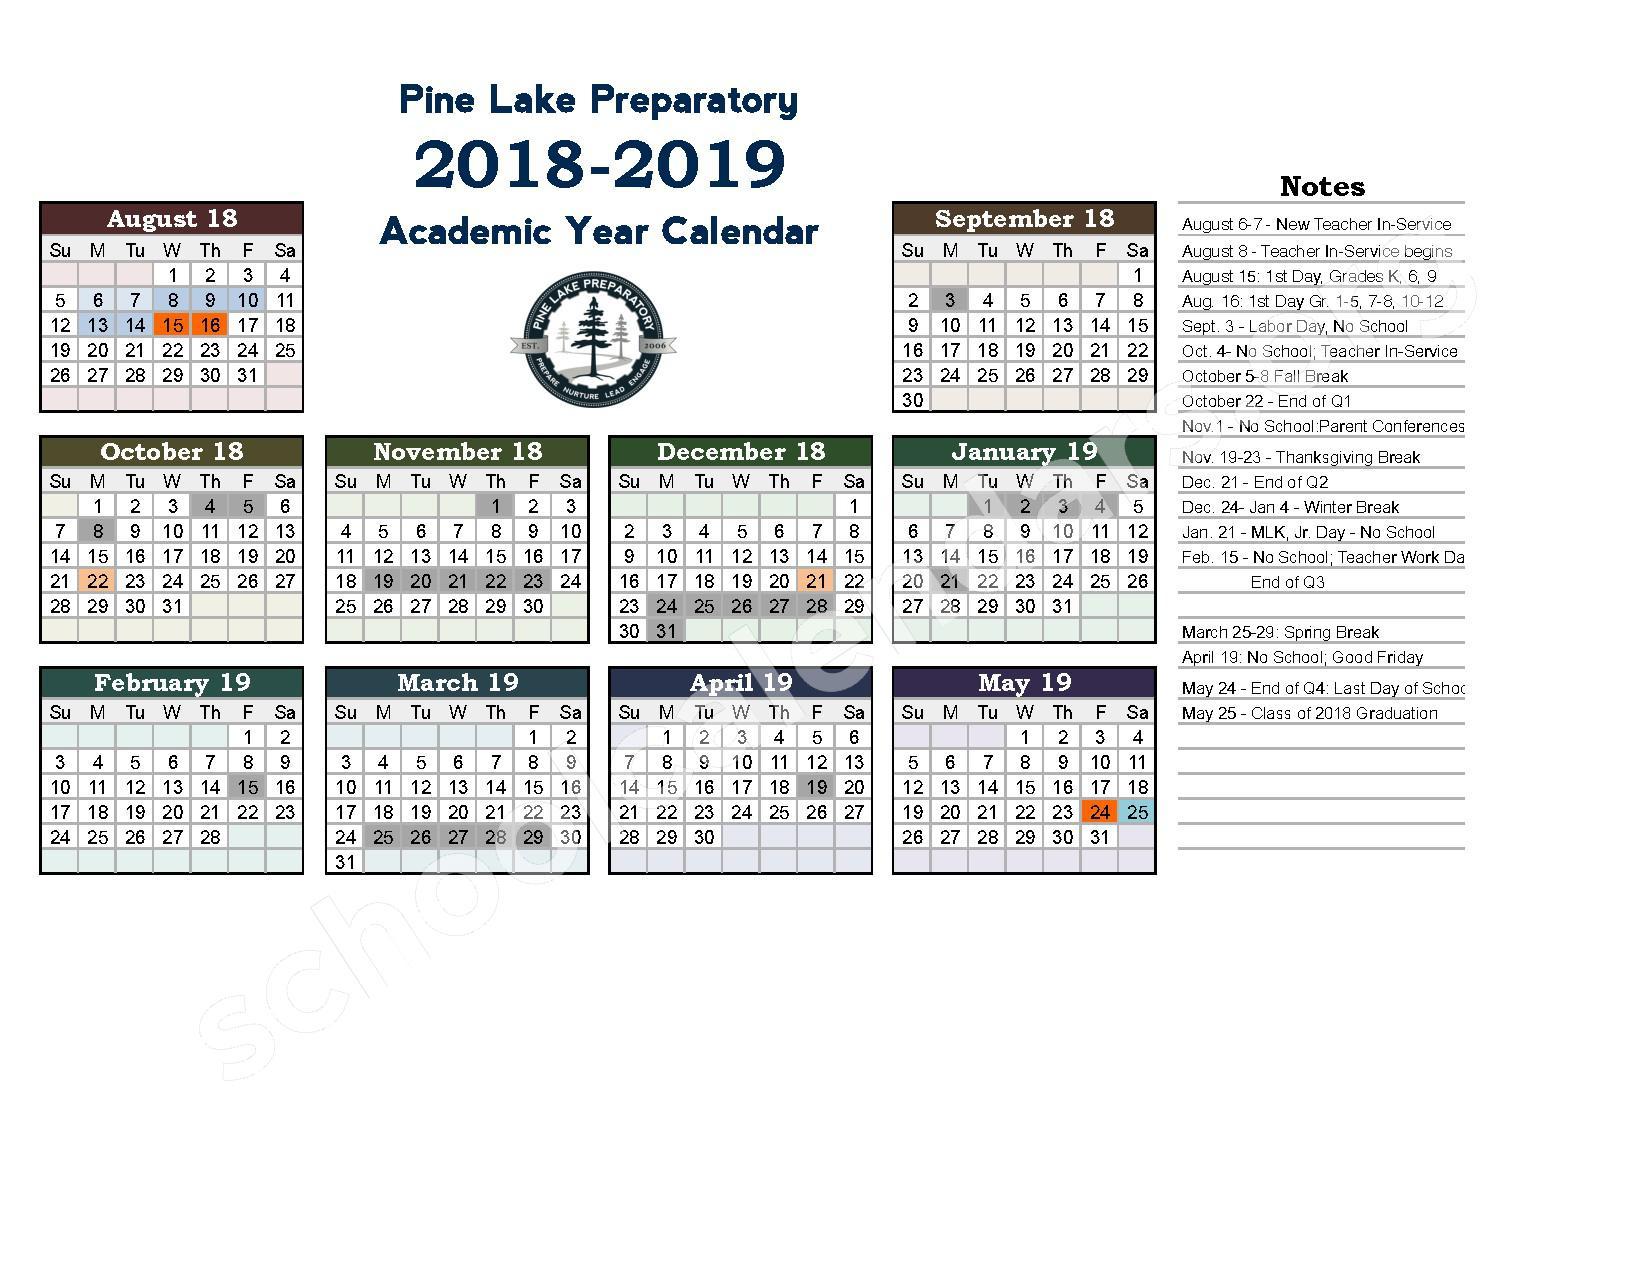 2018 - 2019 School Calendar – Pine Lake Preparatory – page 1